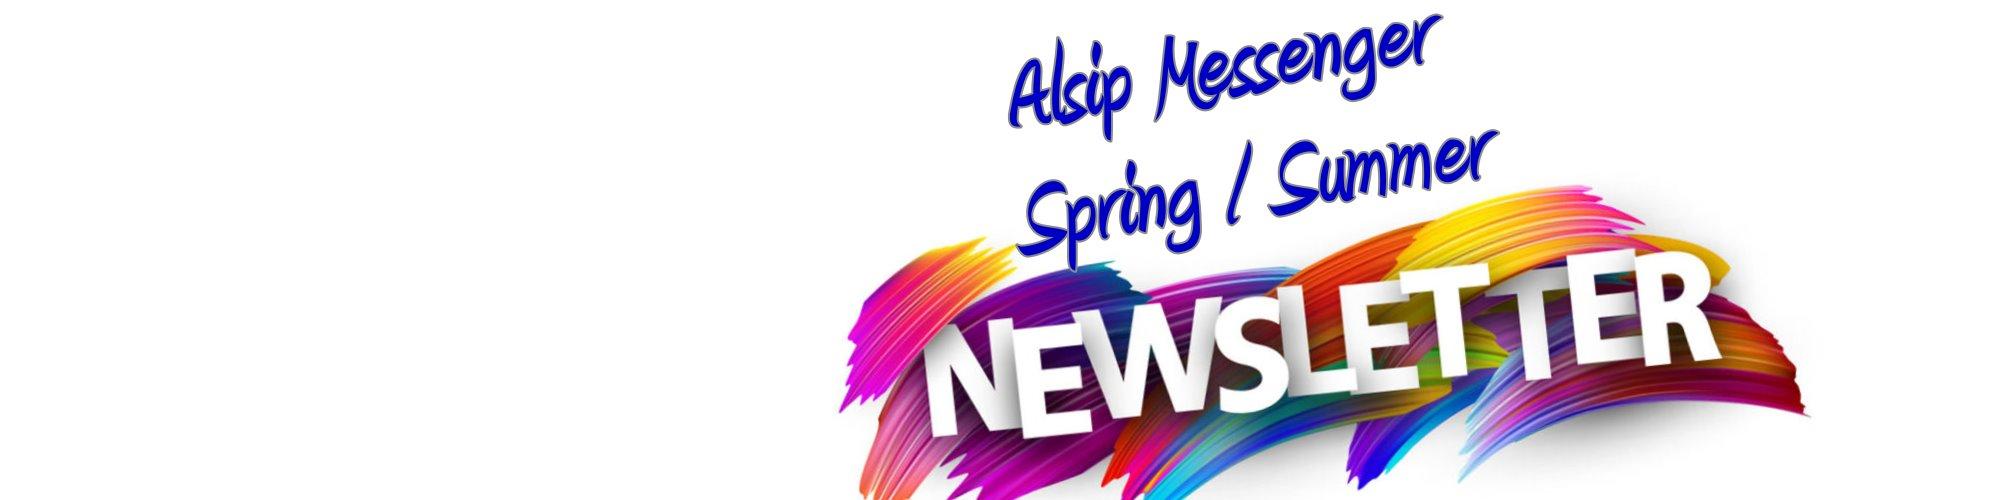 Alsip Spring / Summer Messenger Newsletter